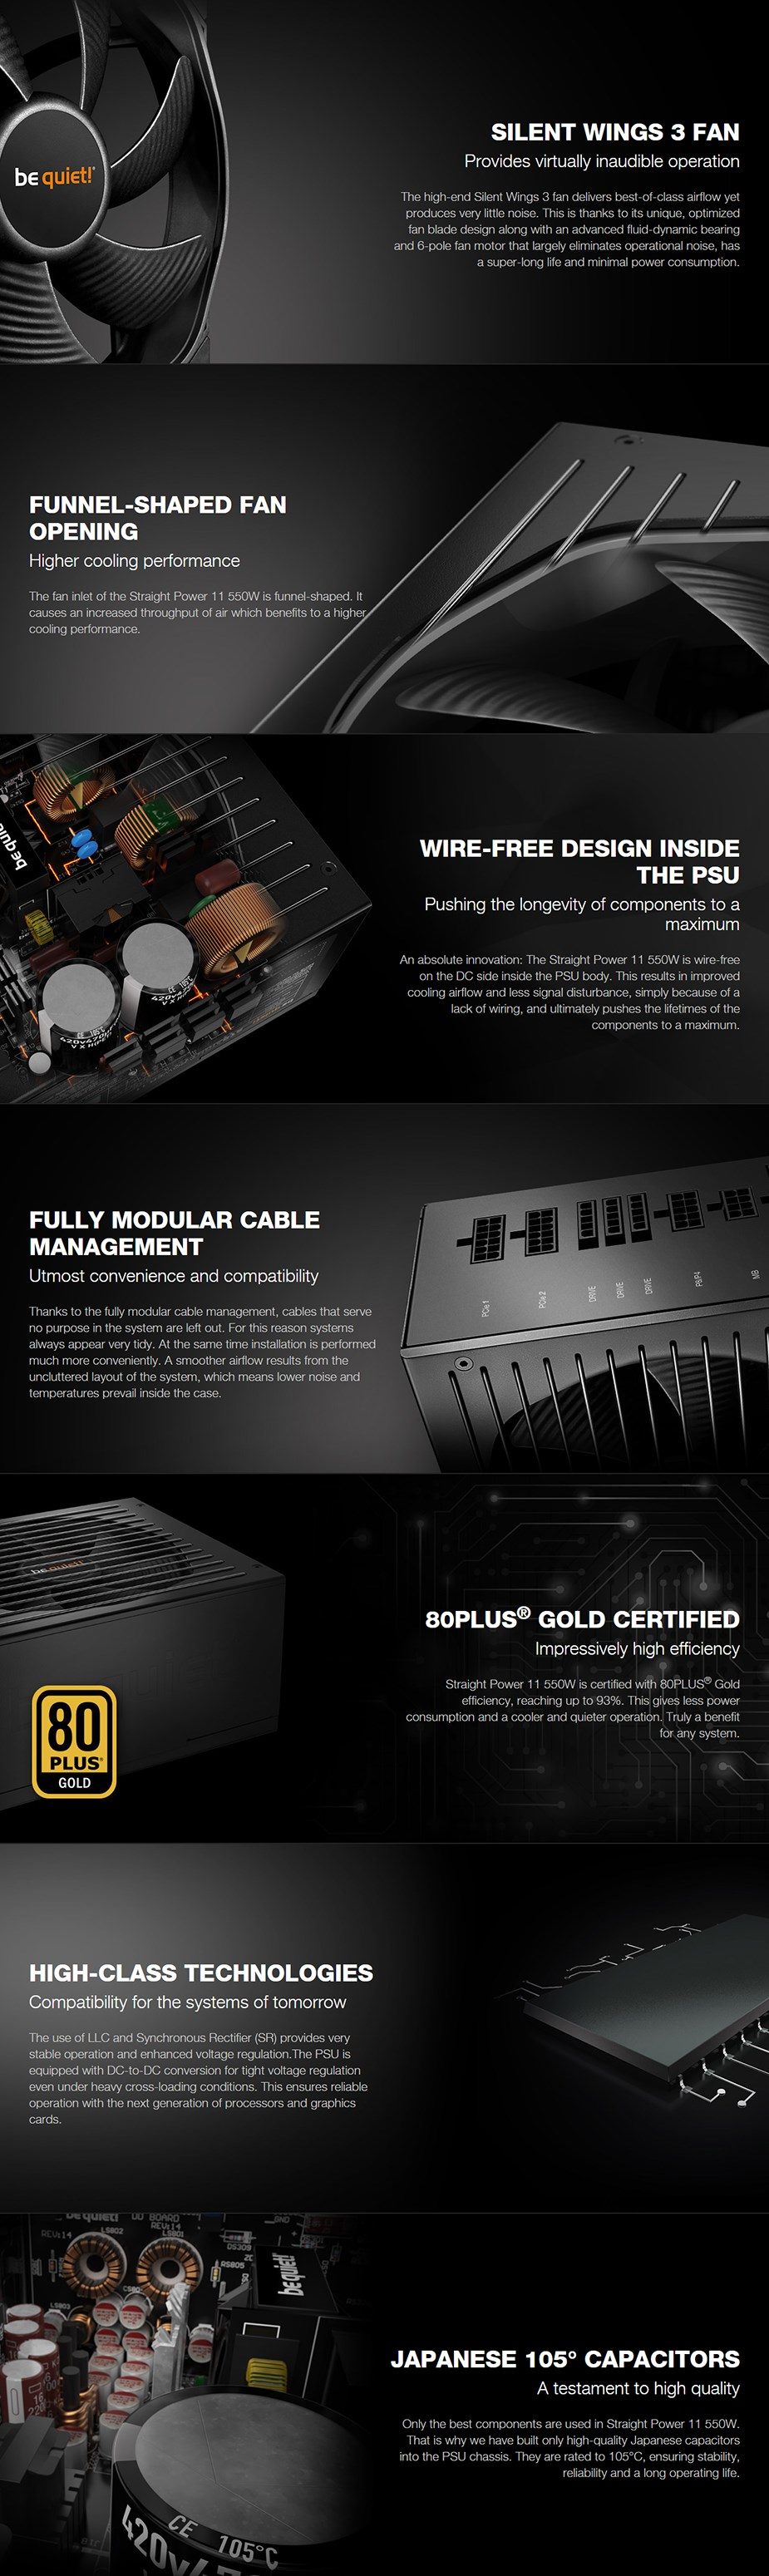 be quiet! Straight Power 11 550W 80+ Gold Modular Power Supply - Desktop Overview 1